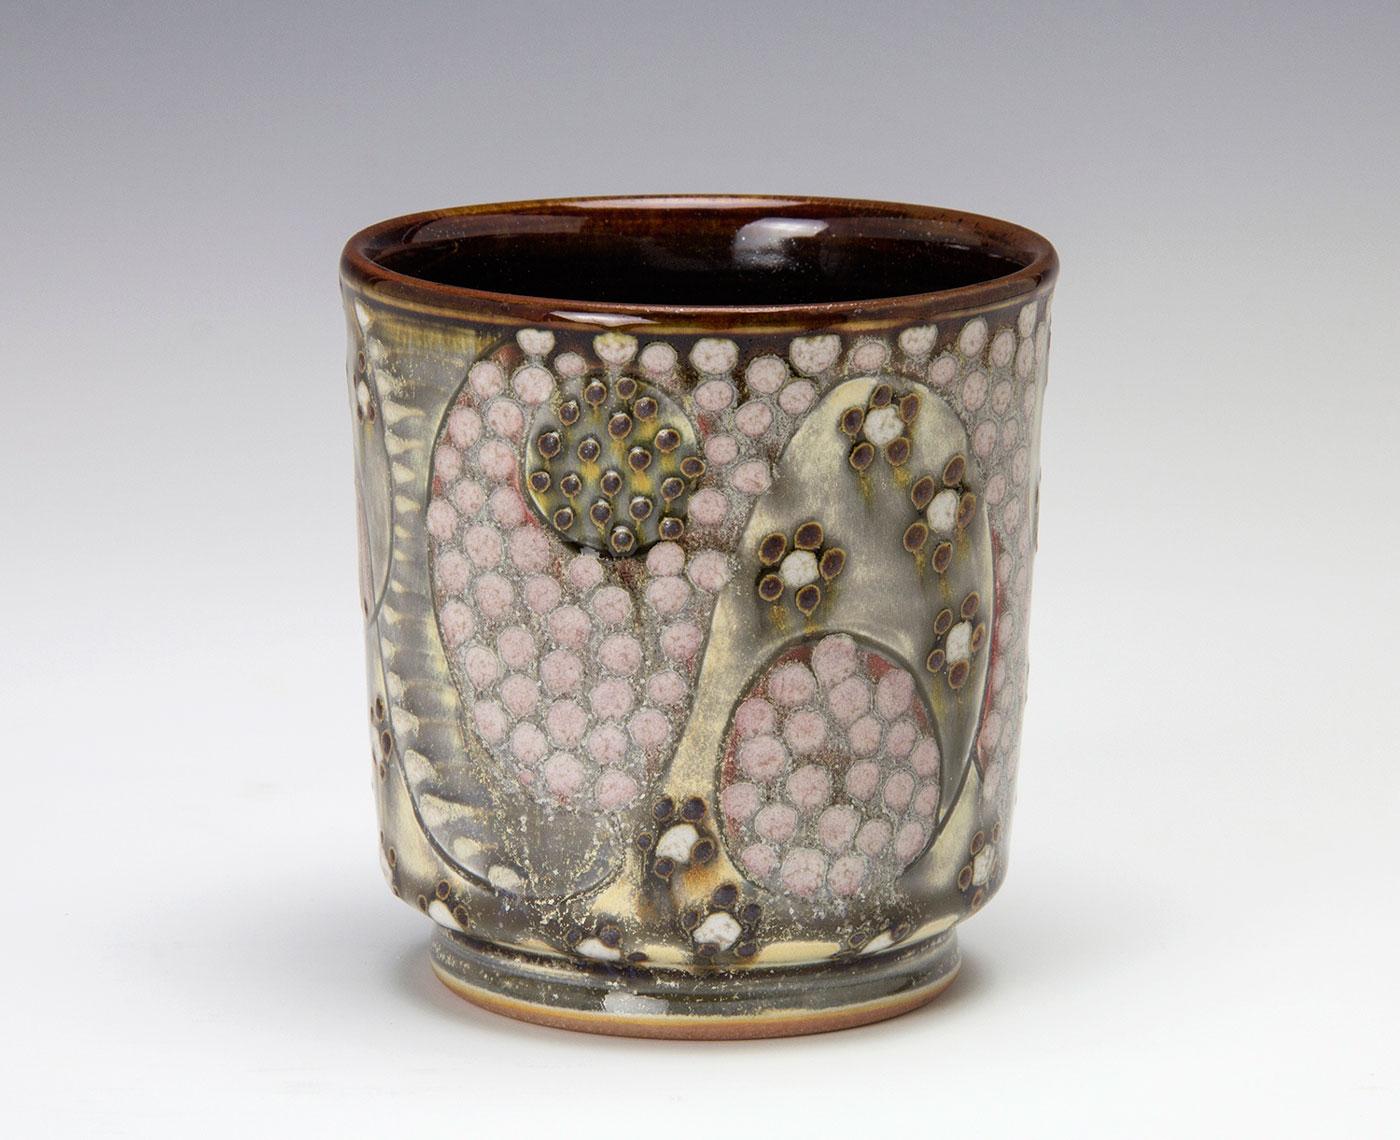 Pattern-Medley-Art-cup-Samantha-Henneke-Bulldog-Pottery-Seagrove-NC.jpg